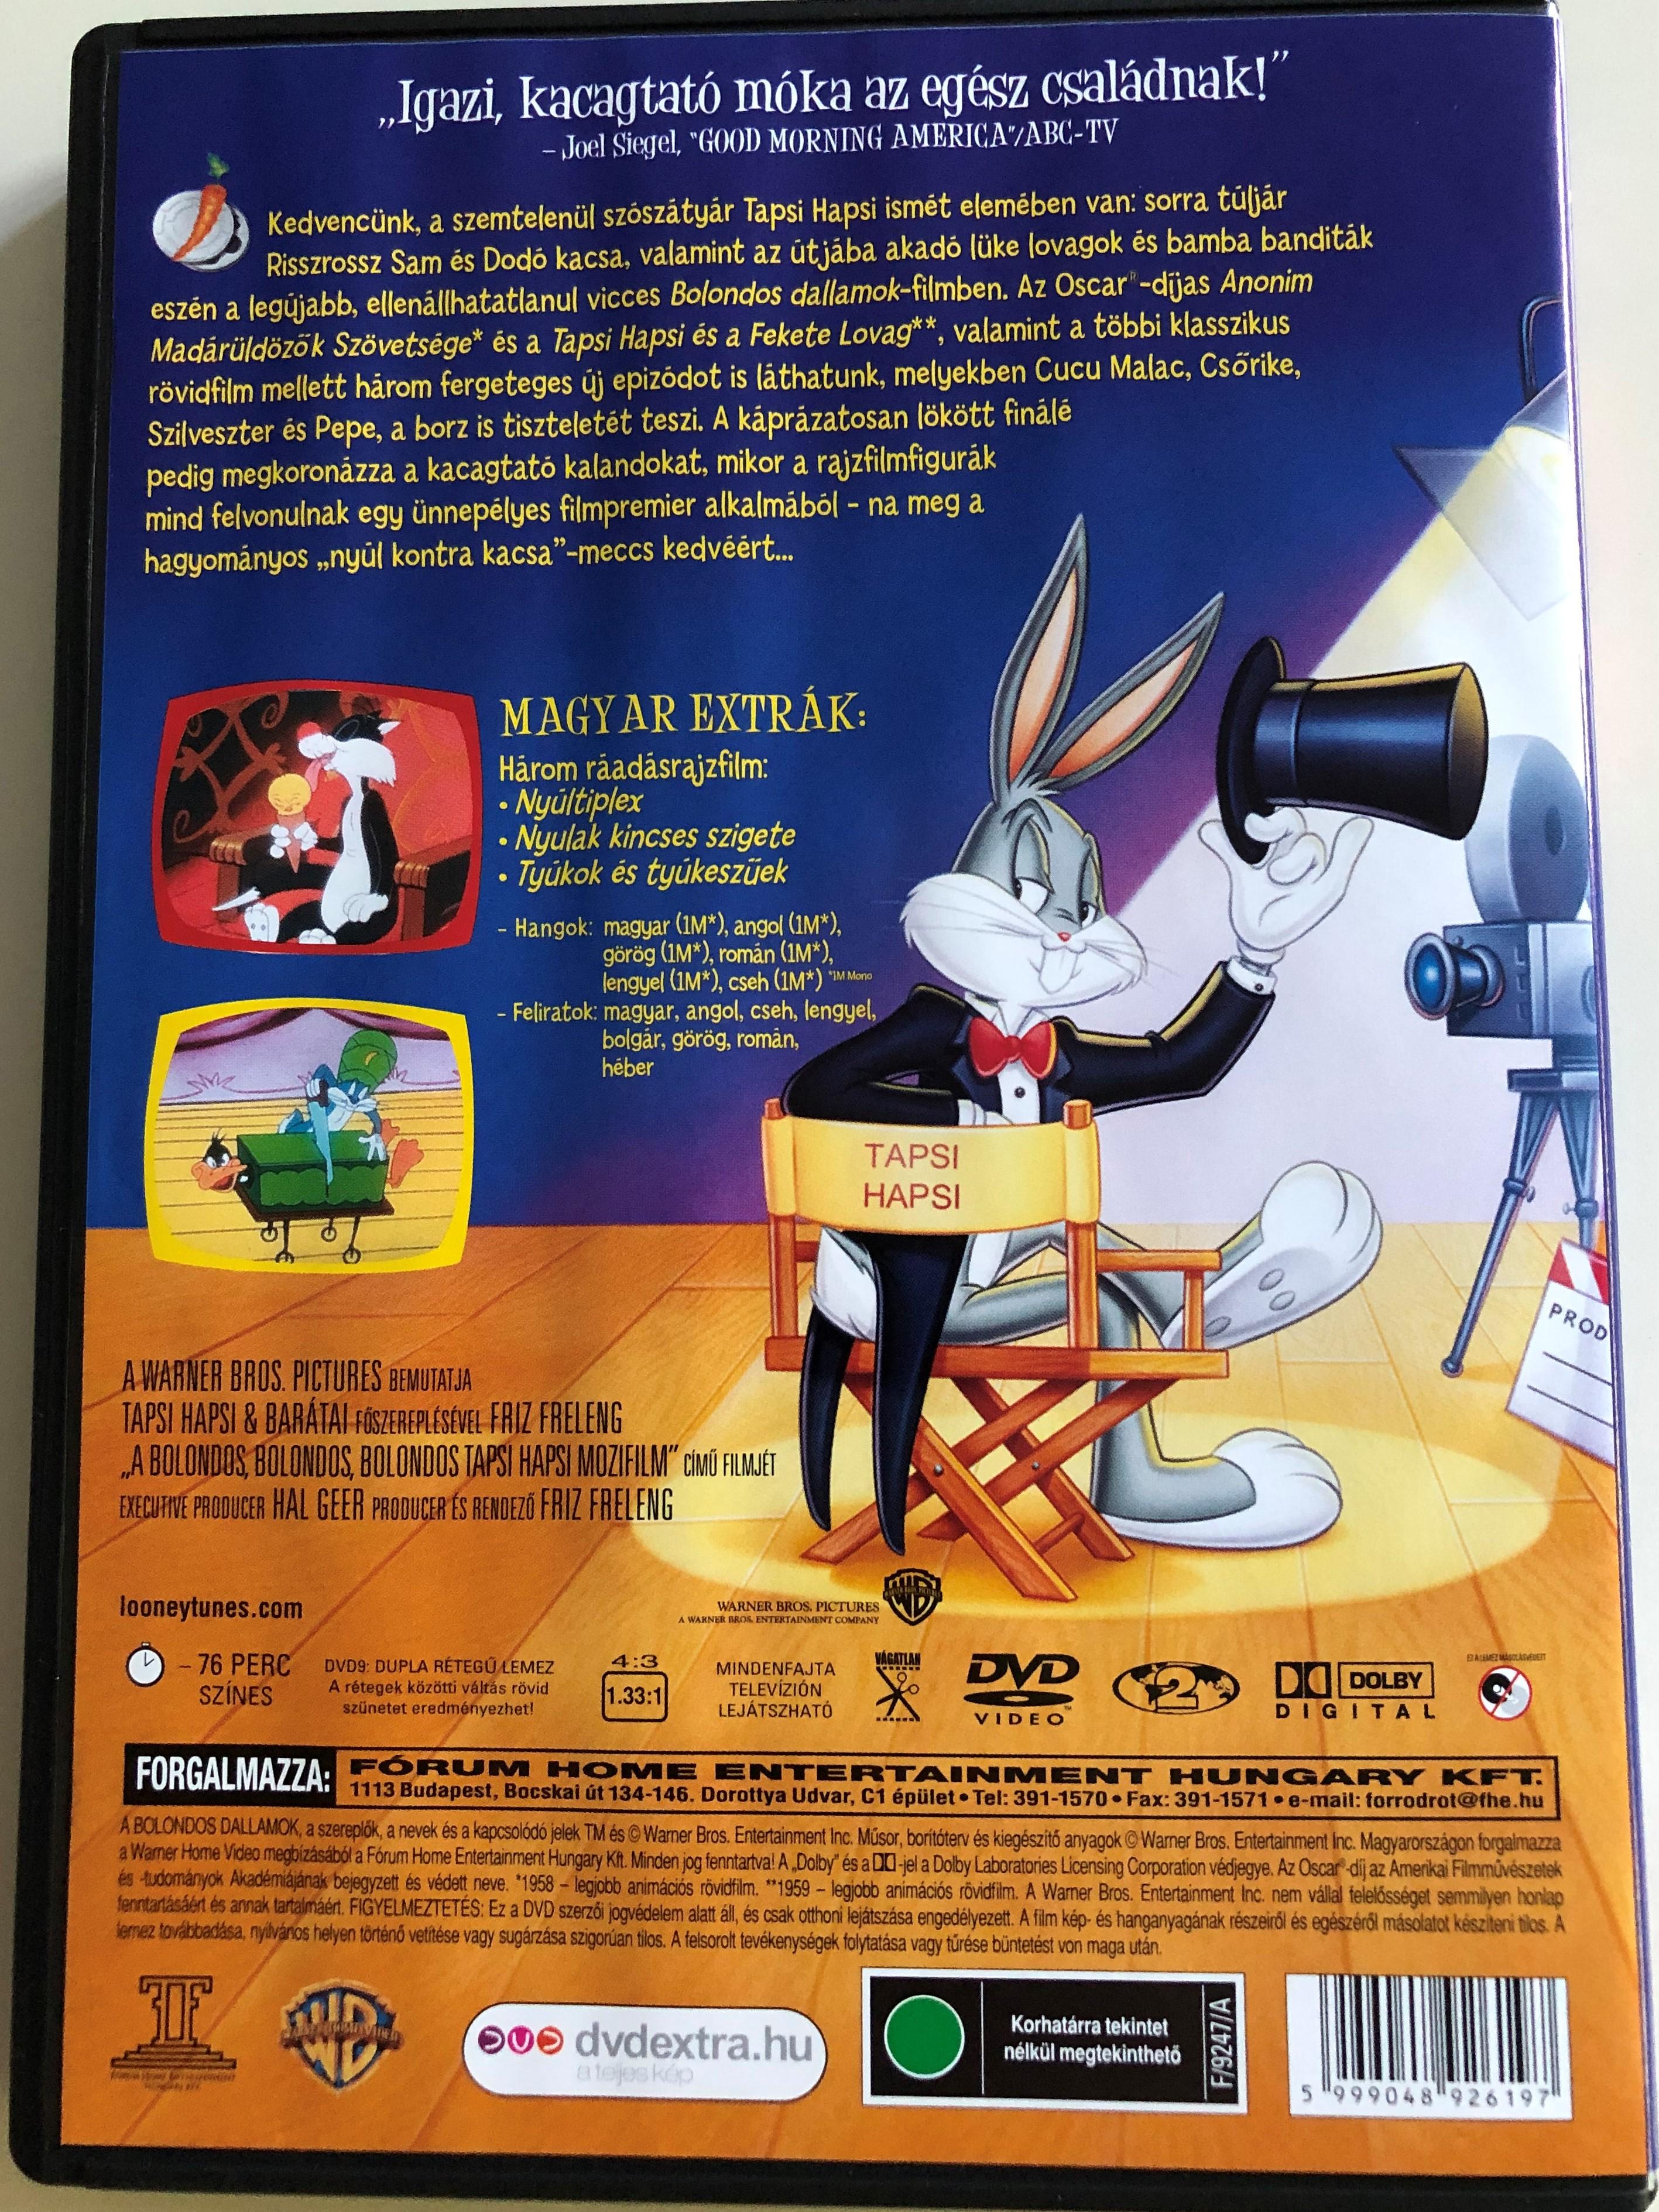 the-looney-looney-looney-bugs-bunny-movie-dvd-1981-a-bolondos-bolondos-bolondos-tapsi-hapsi-mozifilm-directed-by-friz-freleng-starring-mel-blanc-june-foray-3-.jpg